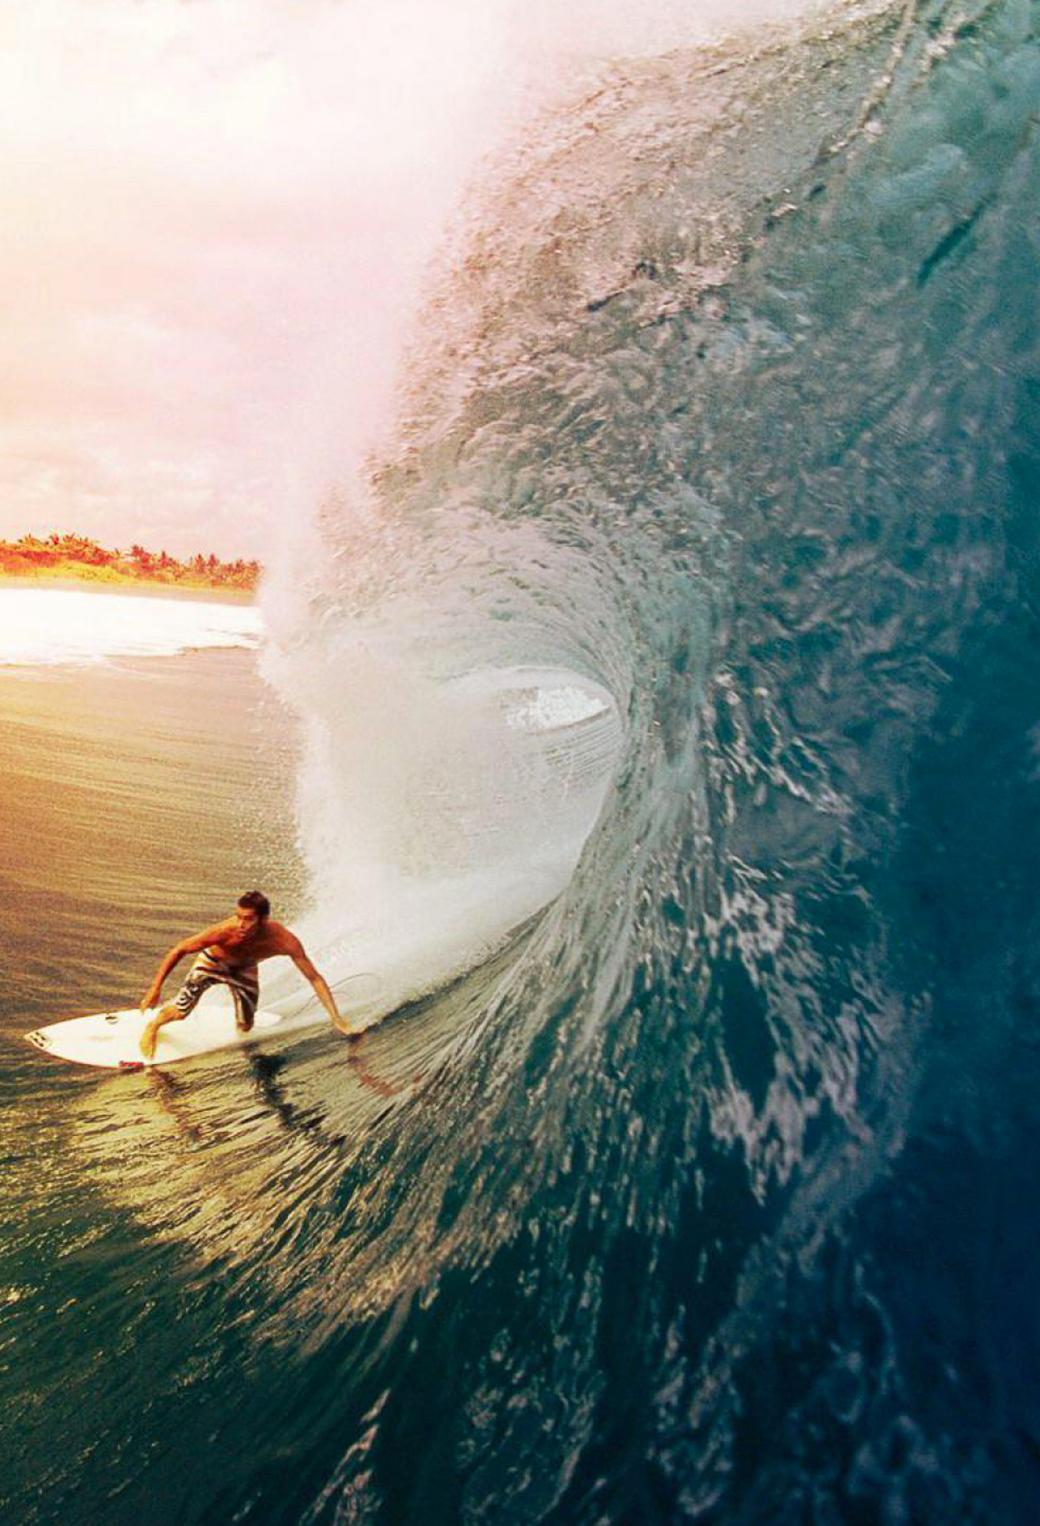 surfer wallpaper iphone 5